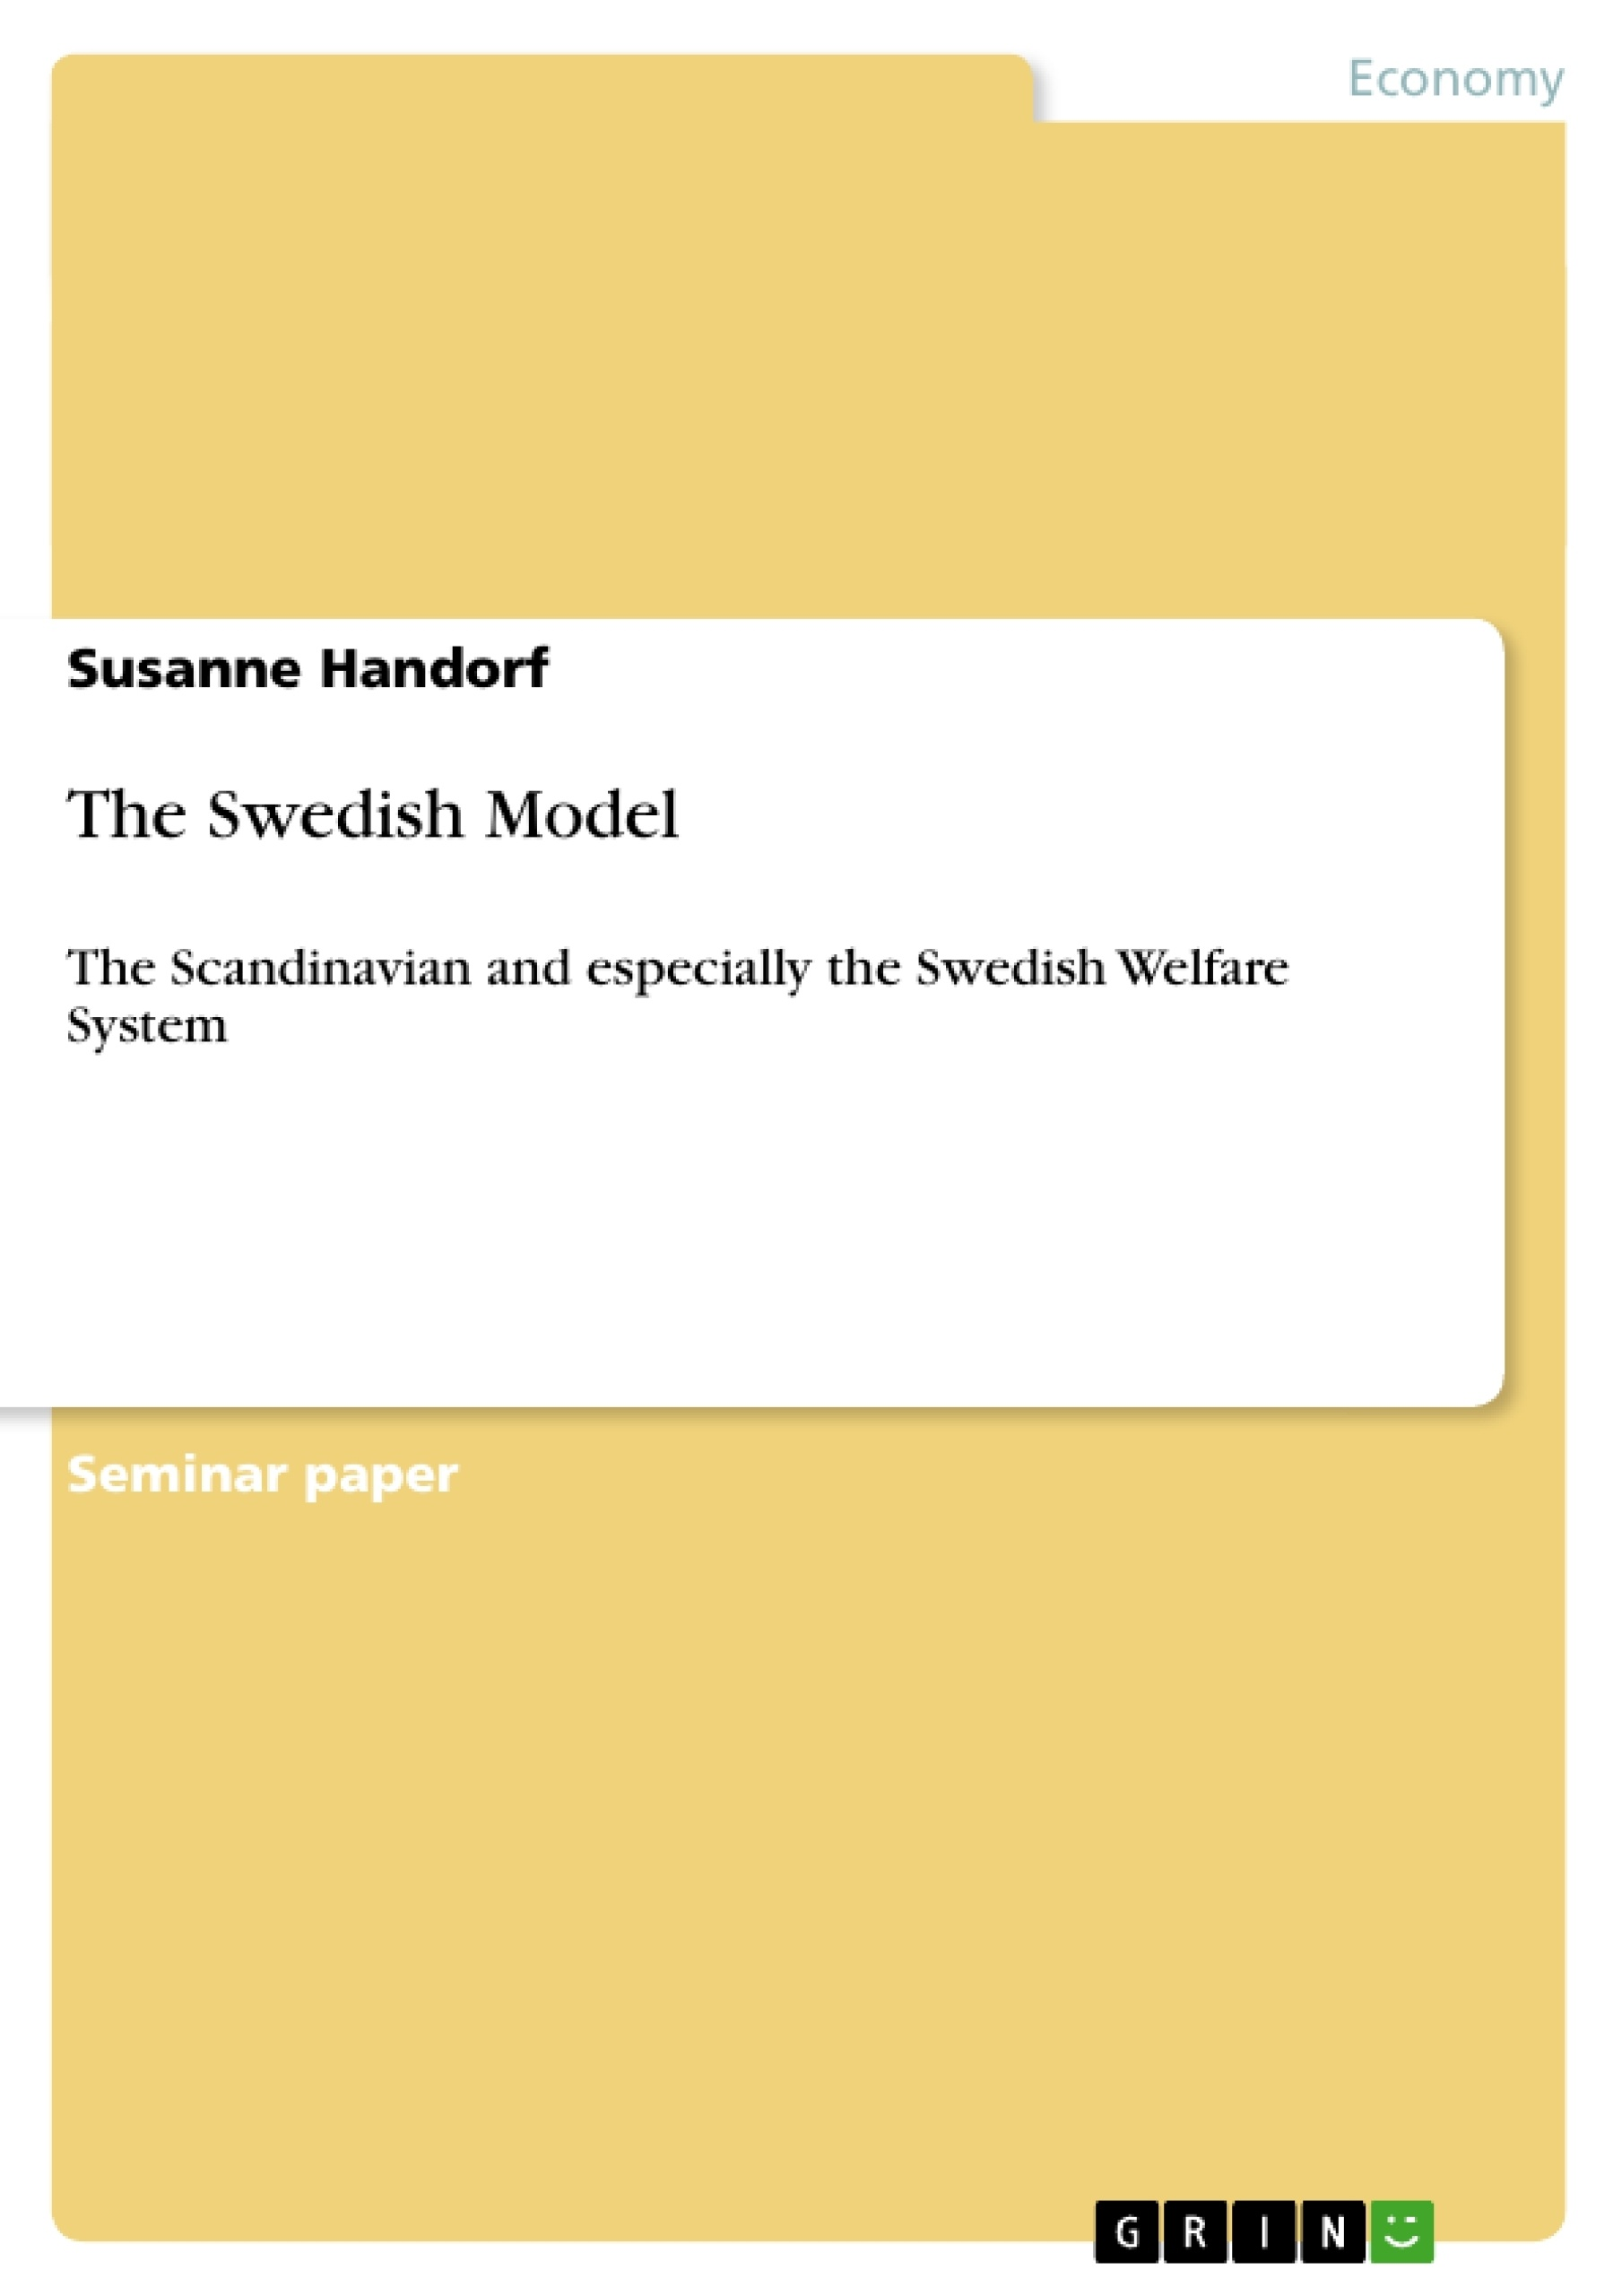 Title: The Swedish Model